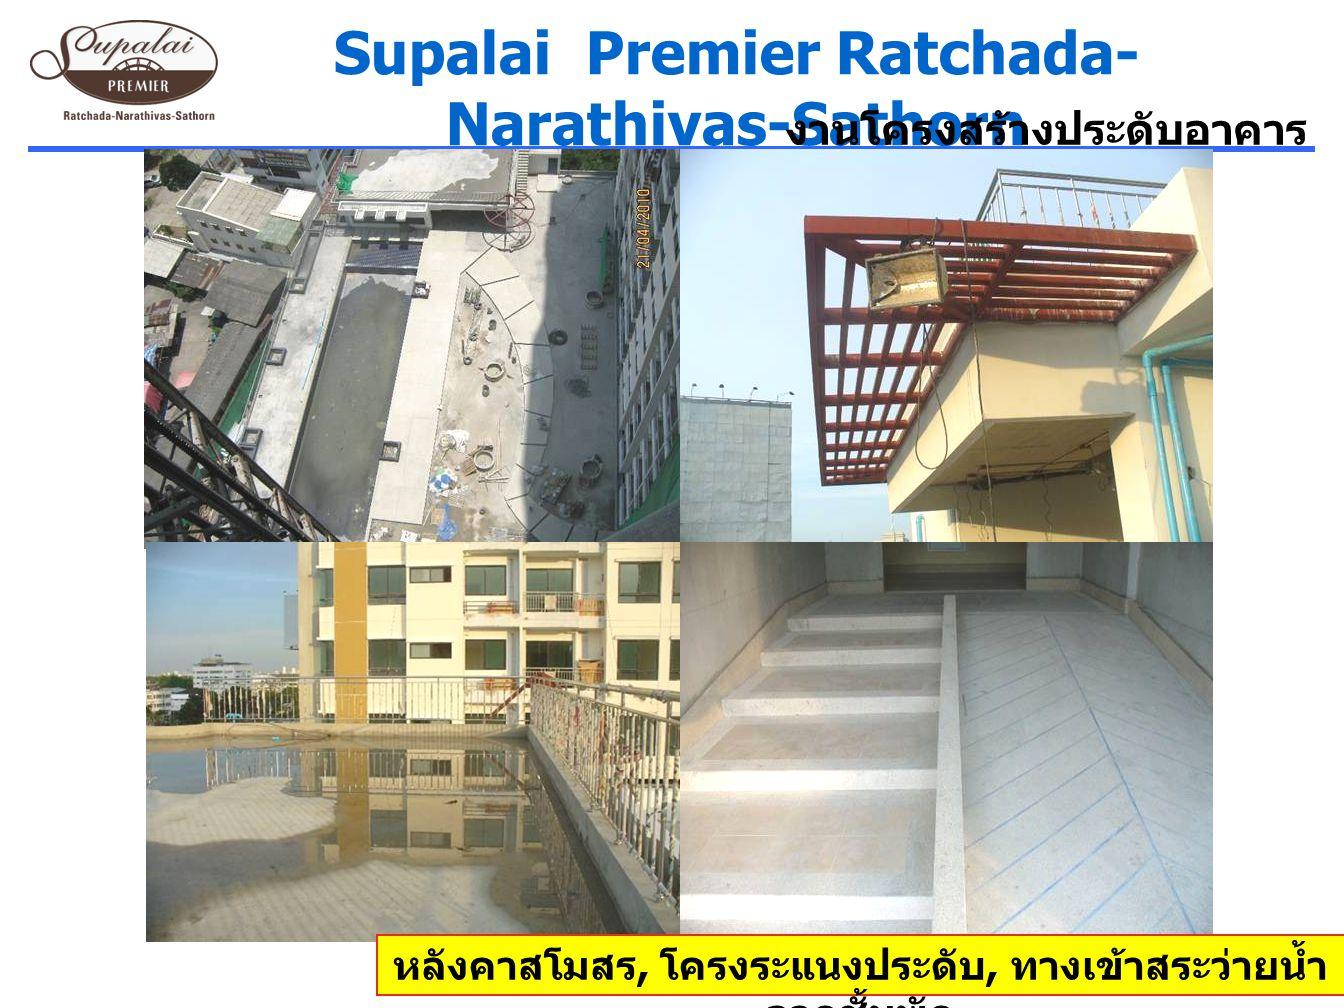 Supalai Premier Ratchada- Narathivas-Sathorn งานโครงสร้างประดับอาคาร หลังคาสโมสร, โครงระแนงประดับ, ทางเข้าสระว่ายน้ำ จากชั้นพัก